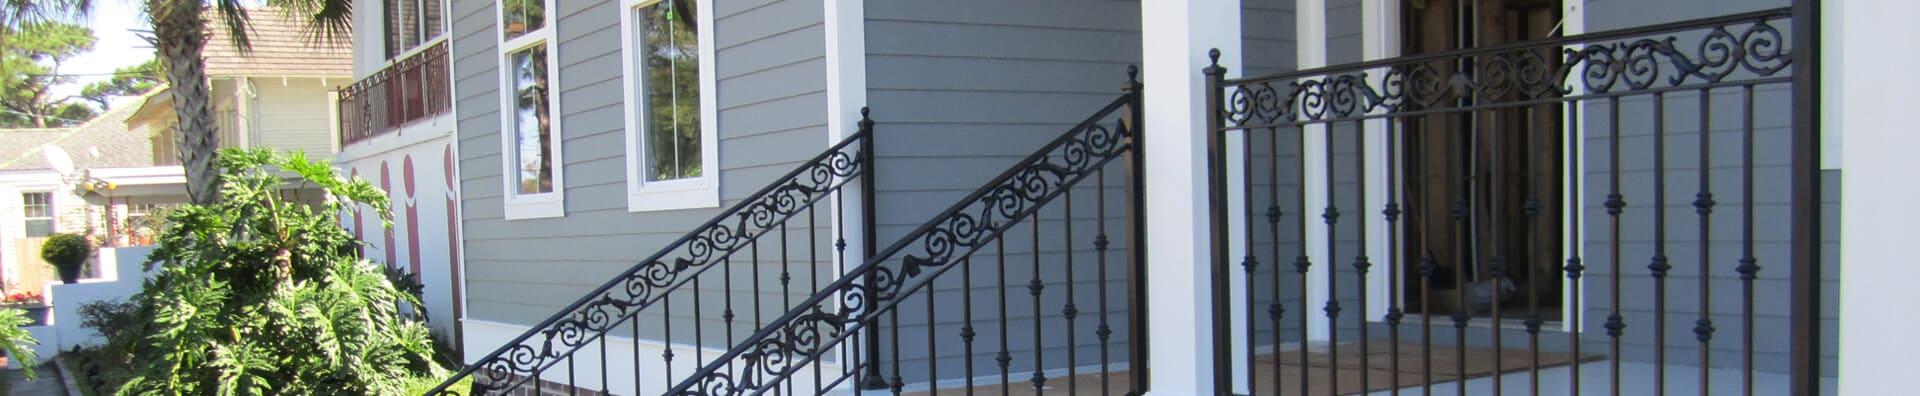 Porch Enclosures New Orleans - Crescent Iron Works